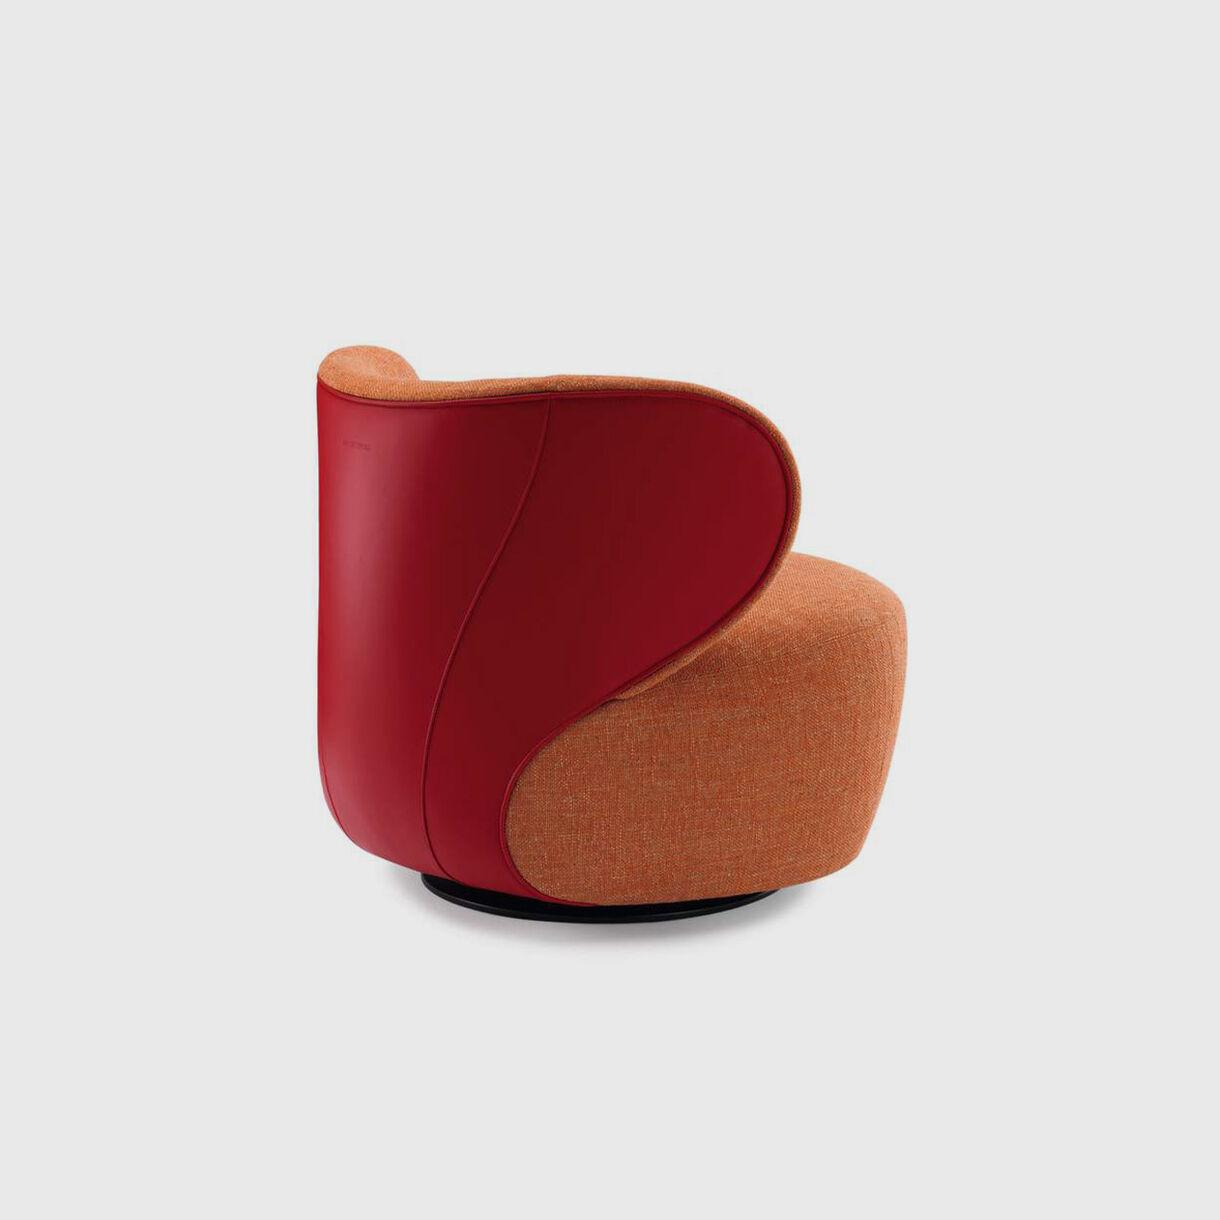 Bao Chair, Orange & Red